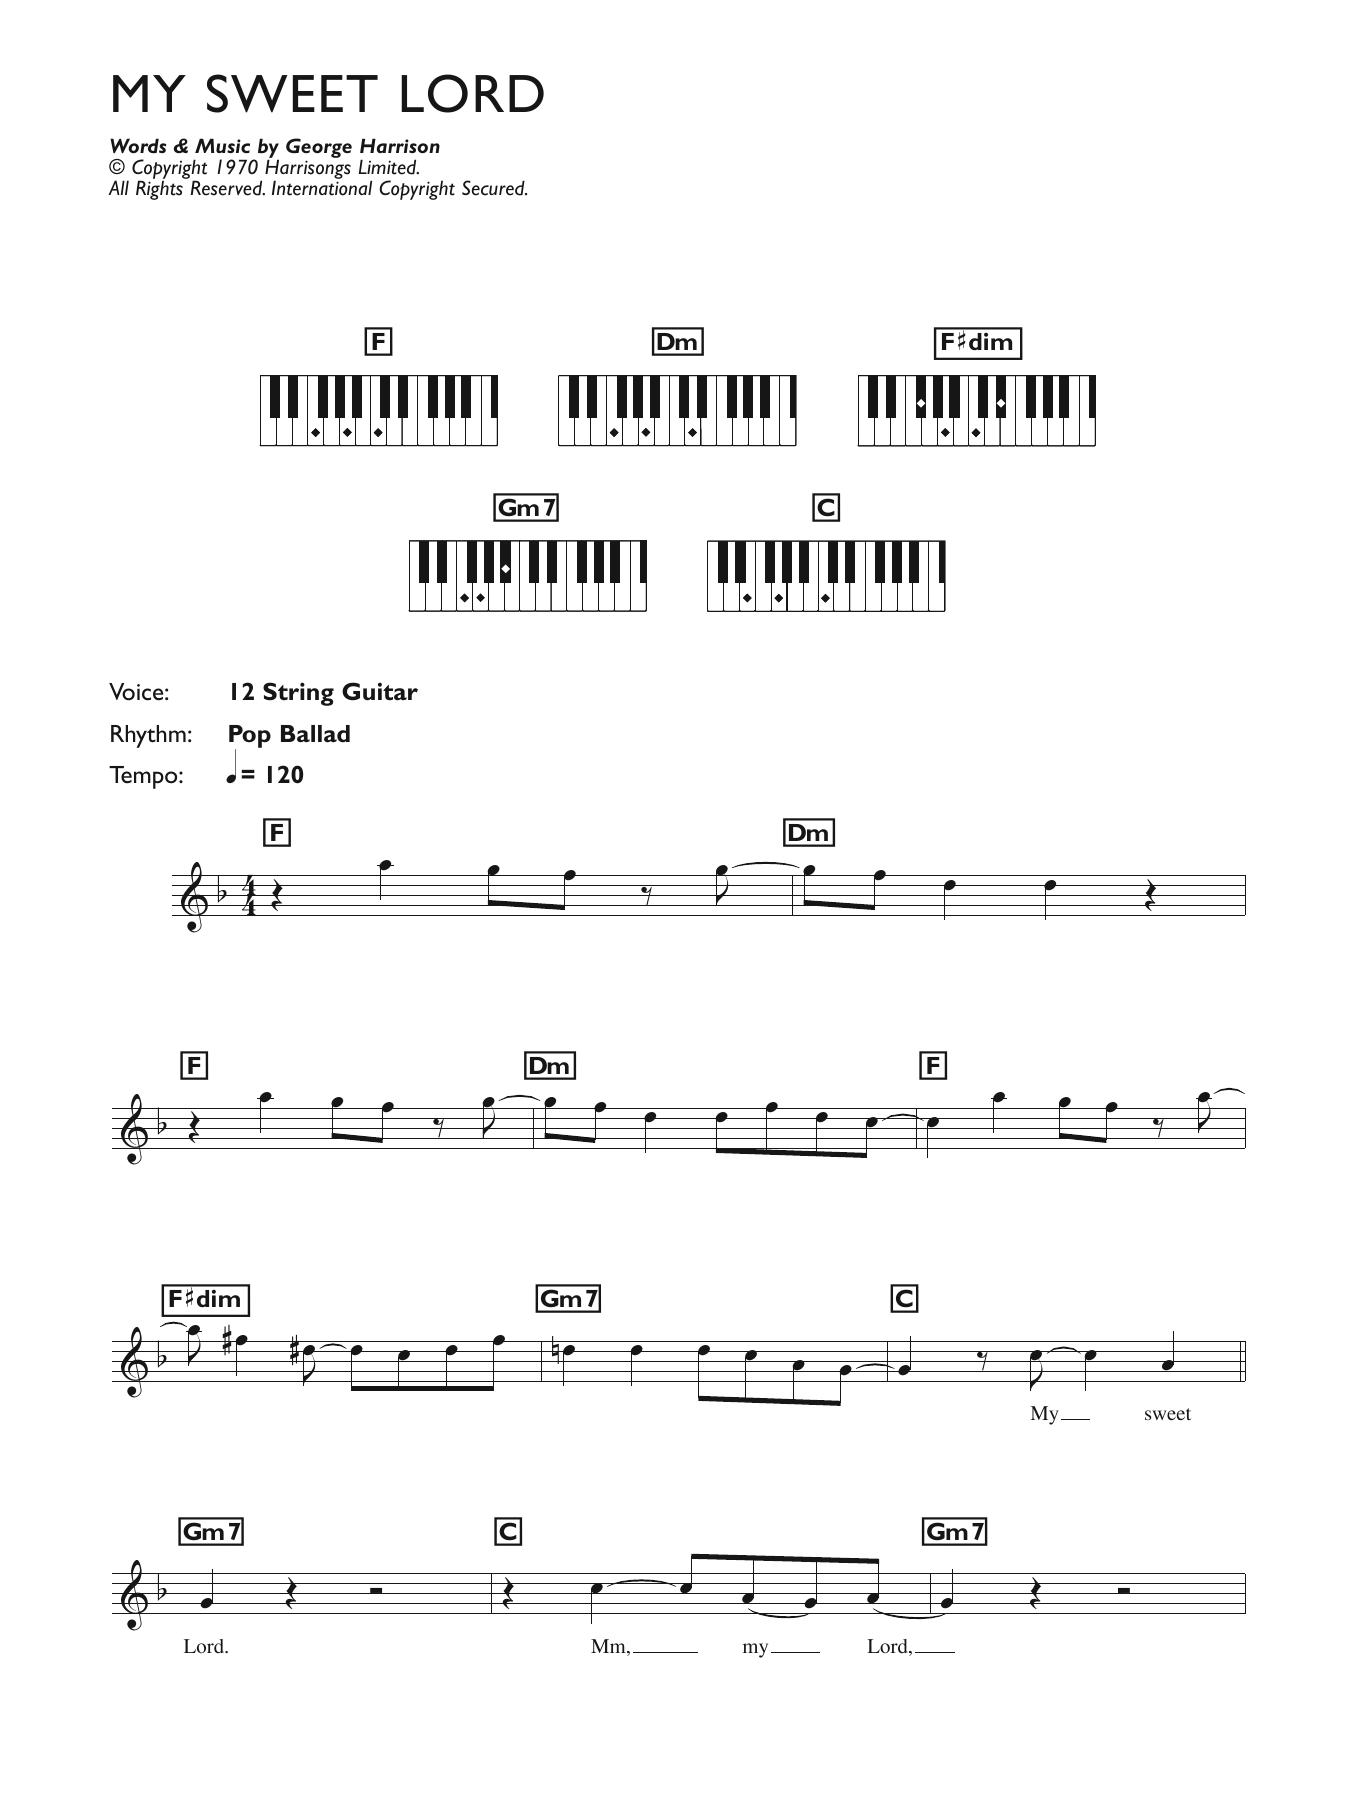 My Sweet Lord Sheet Music